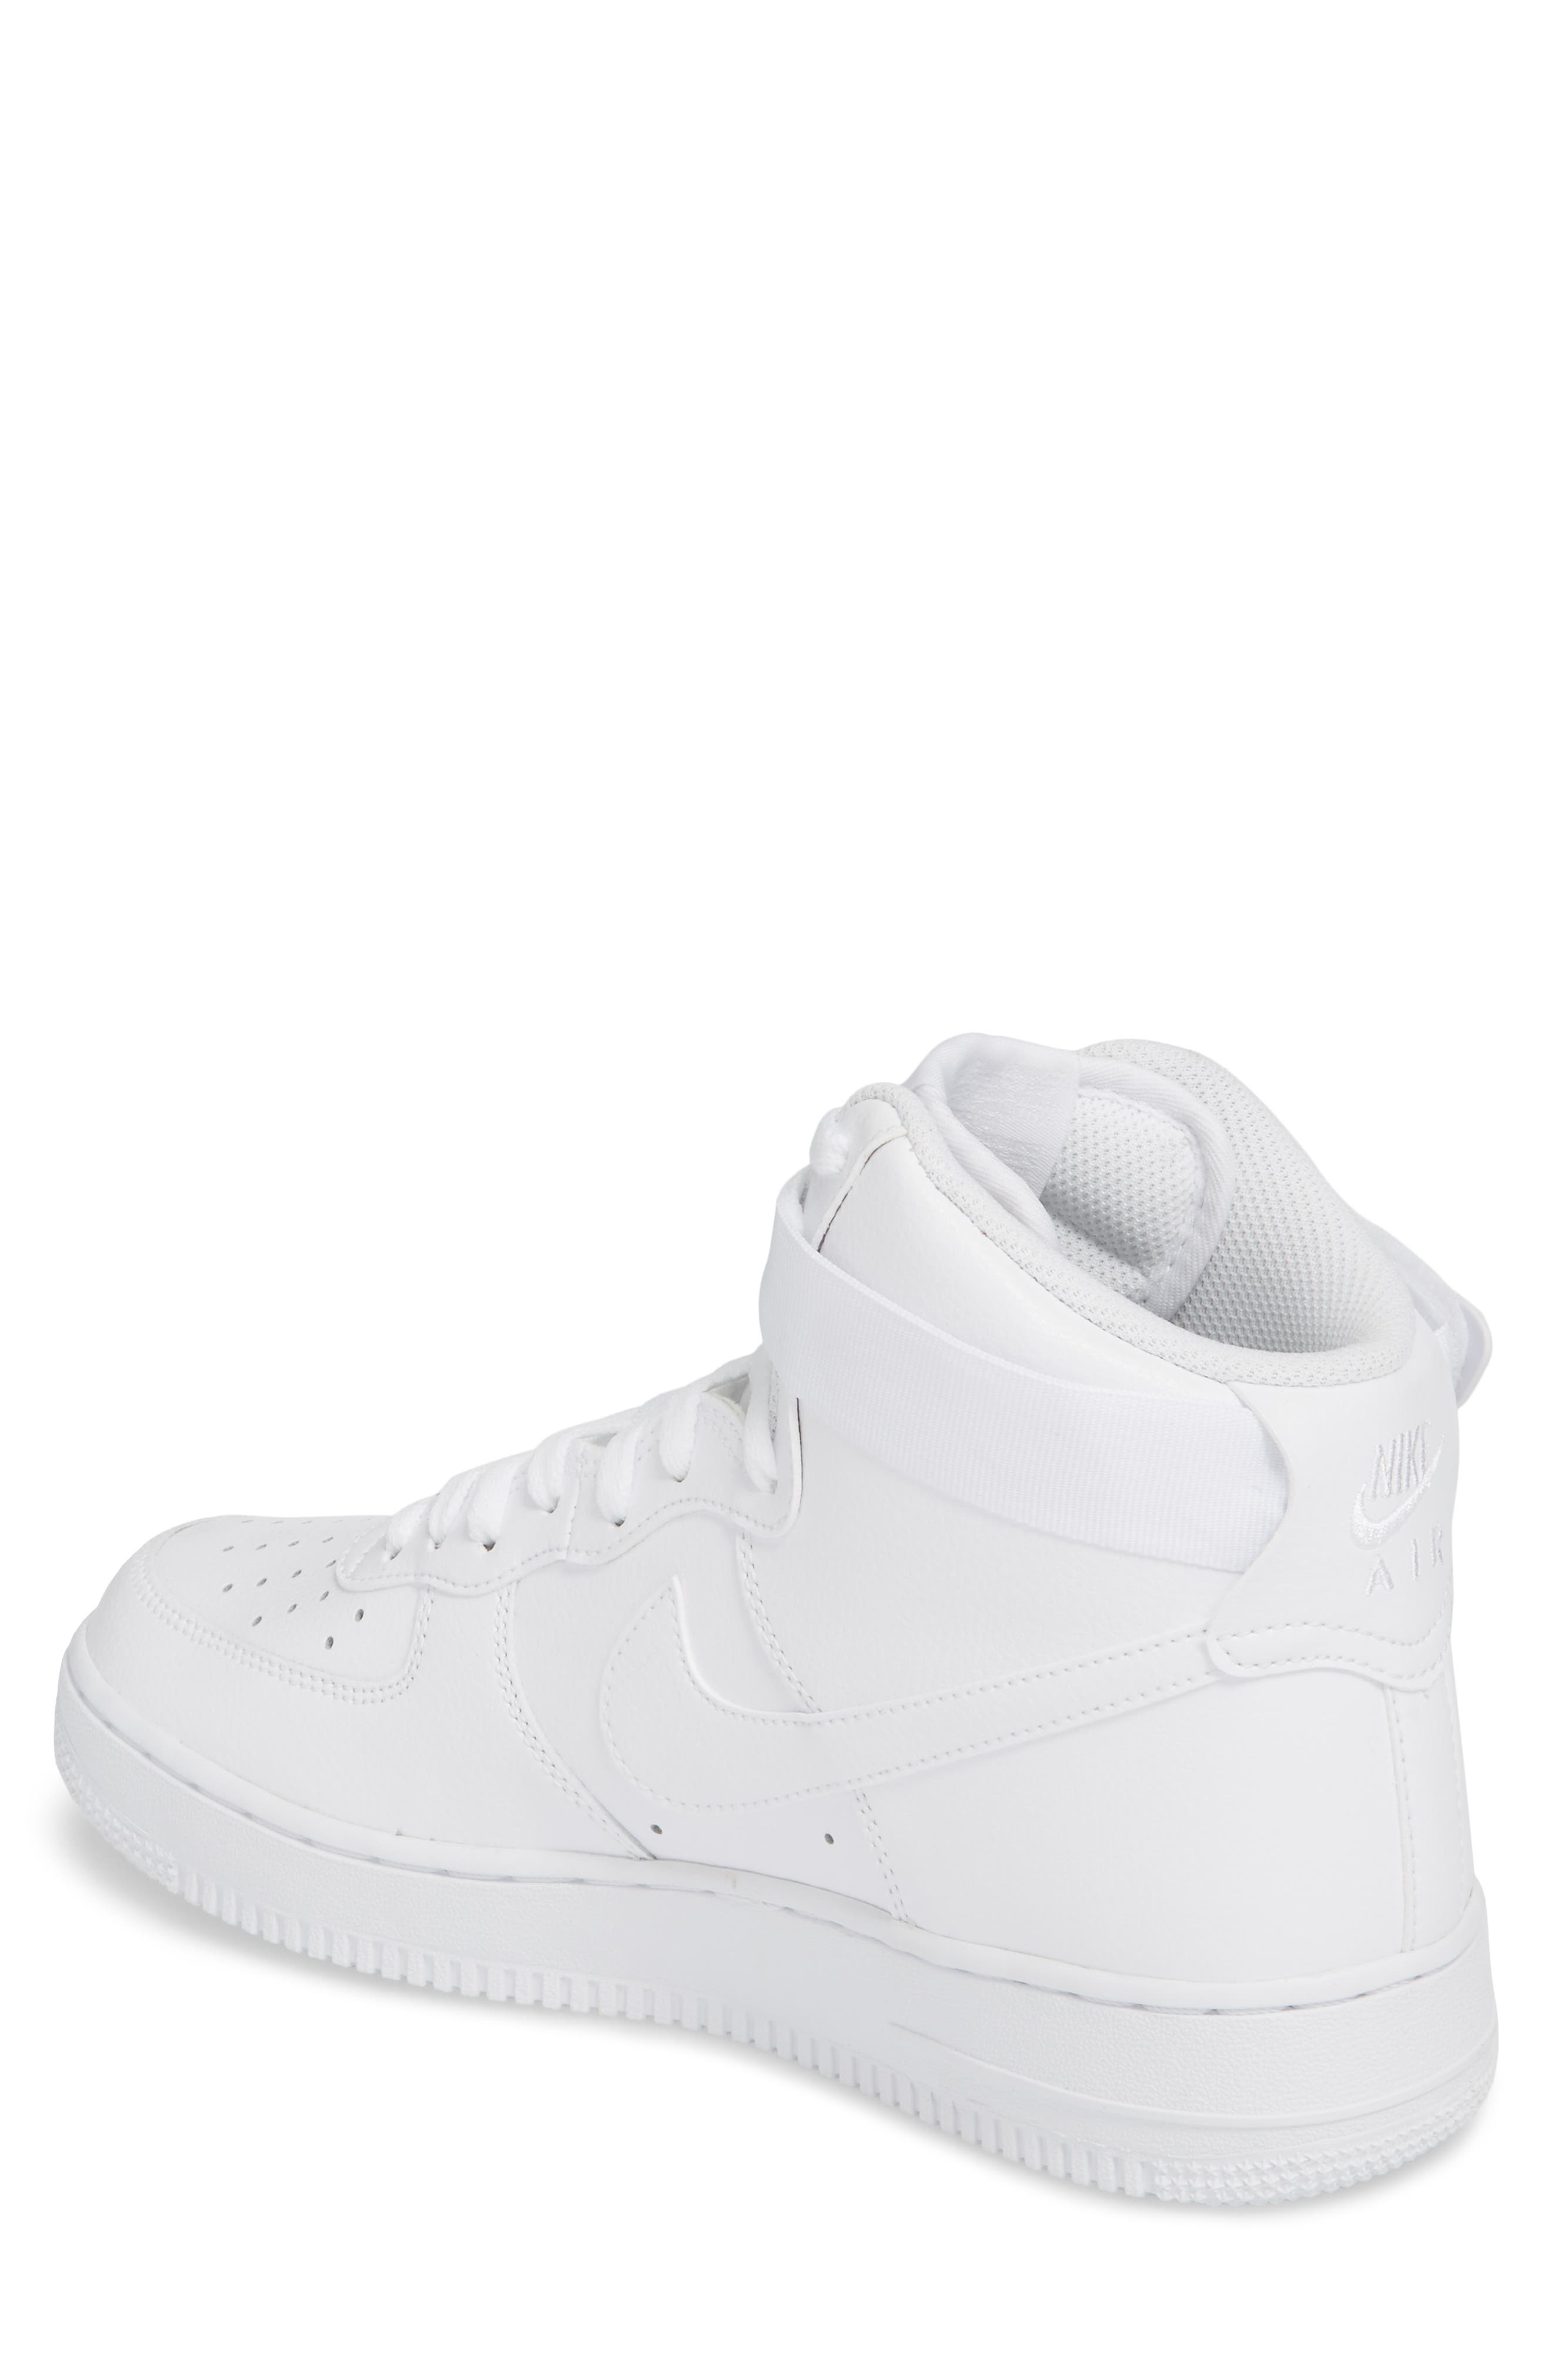 Alternate Image 2  - Nike Air Force 1 High '07 Sneaker (Men)